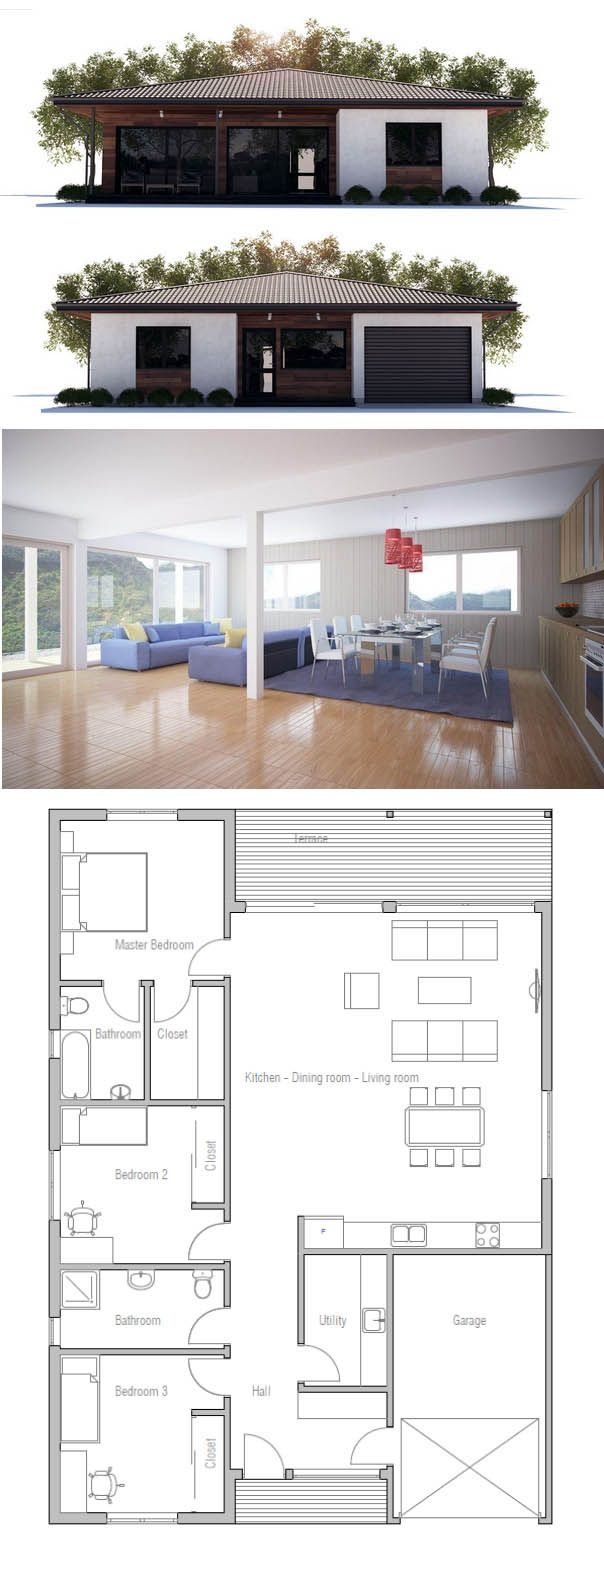 3 bedroom, 2 bathroom floor plan.. Gorgeous